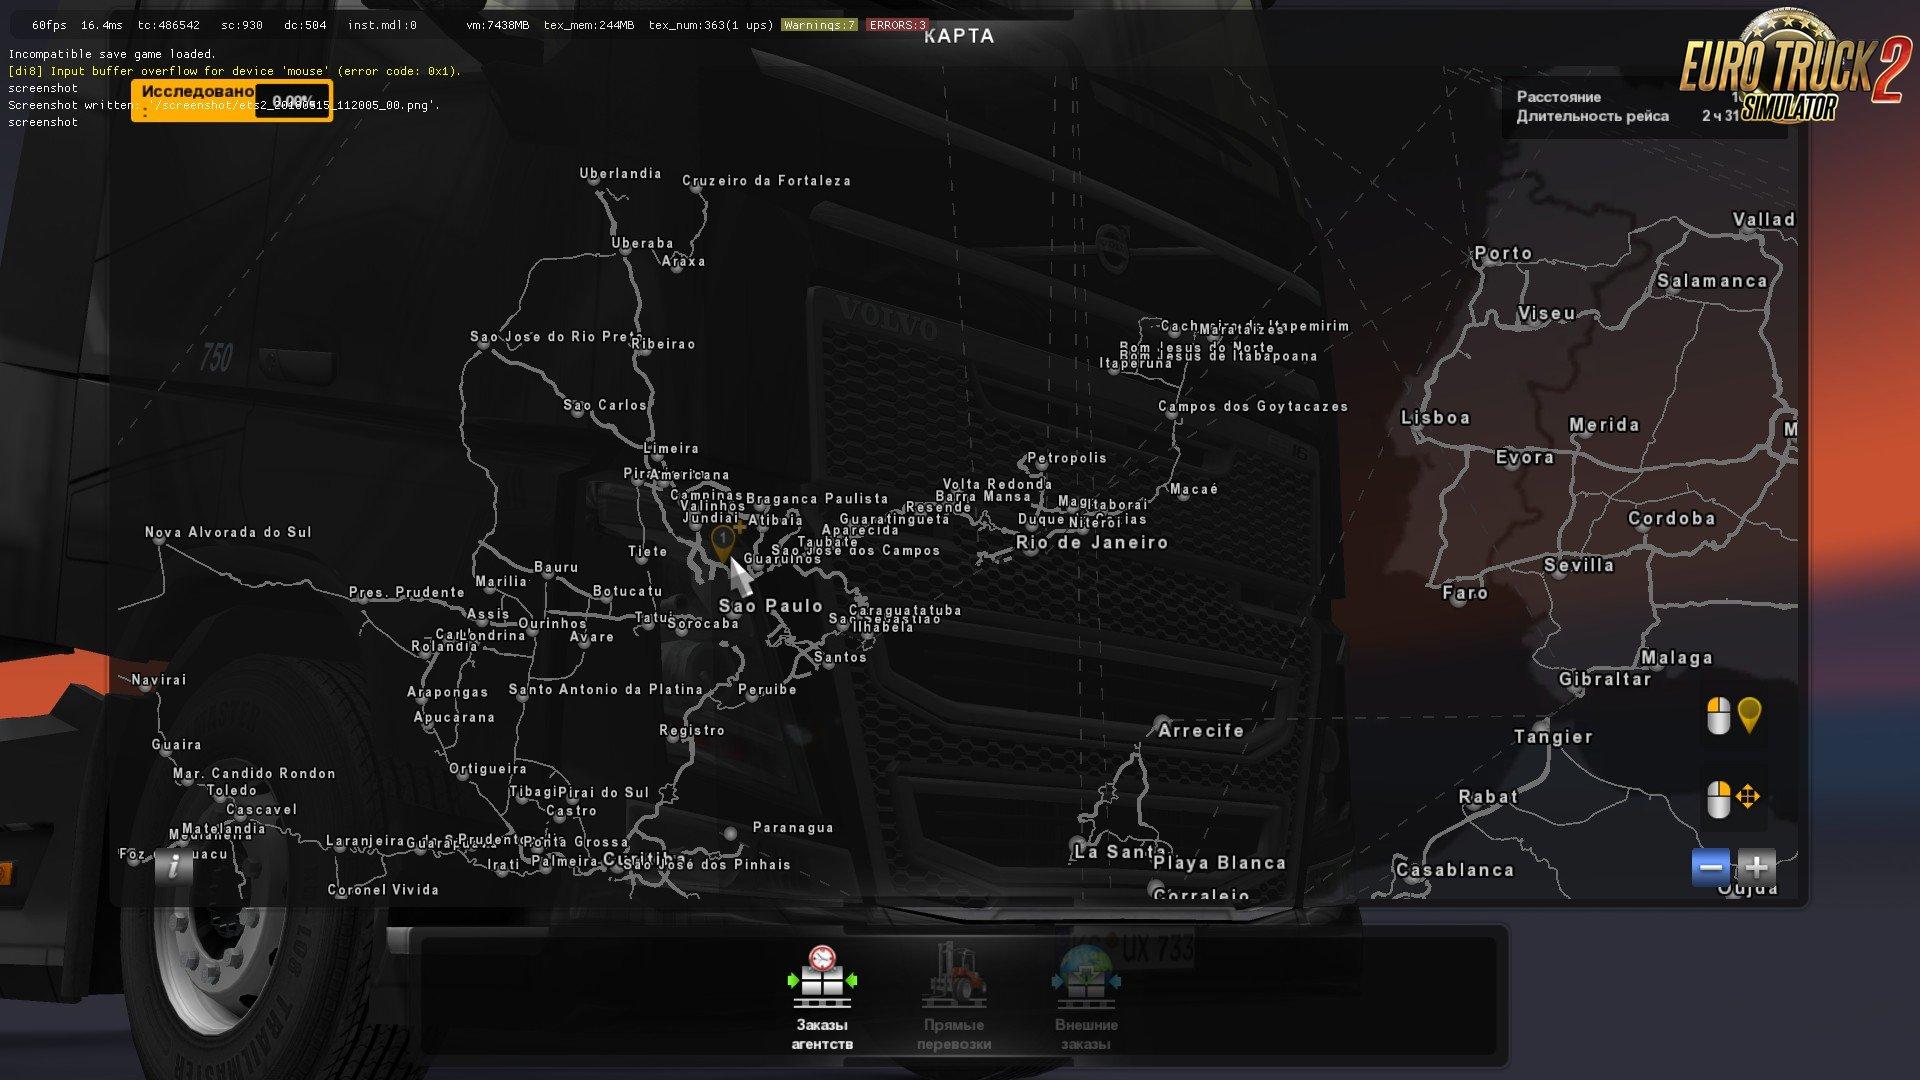 euro truck simulator 2 new update v 1.32 download 2018